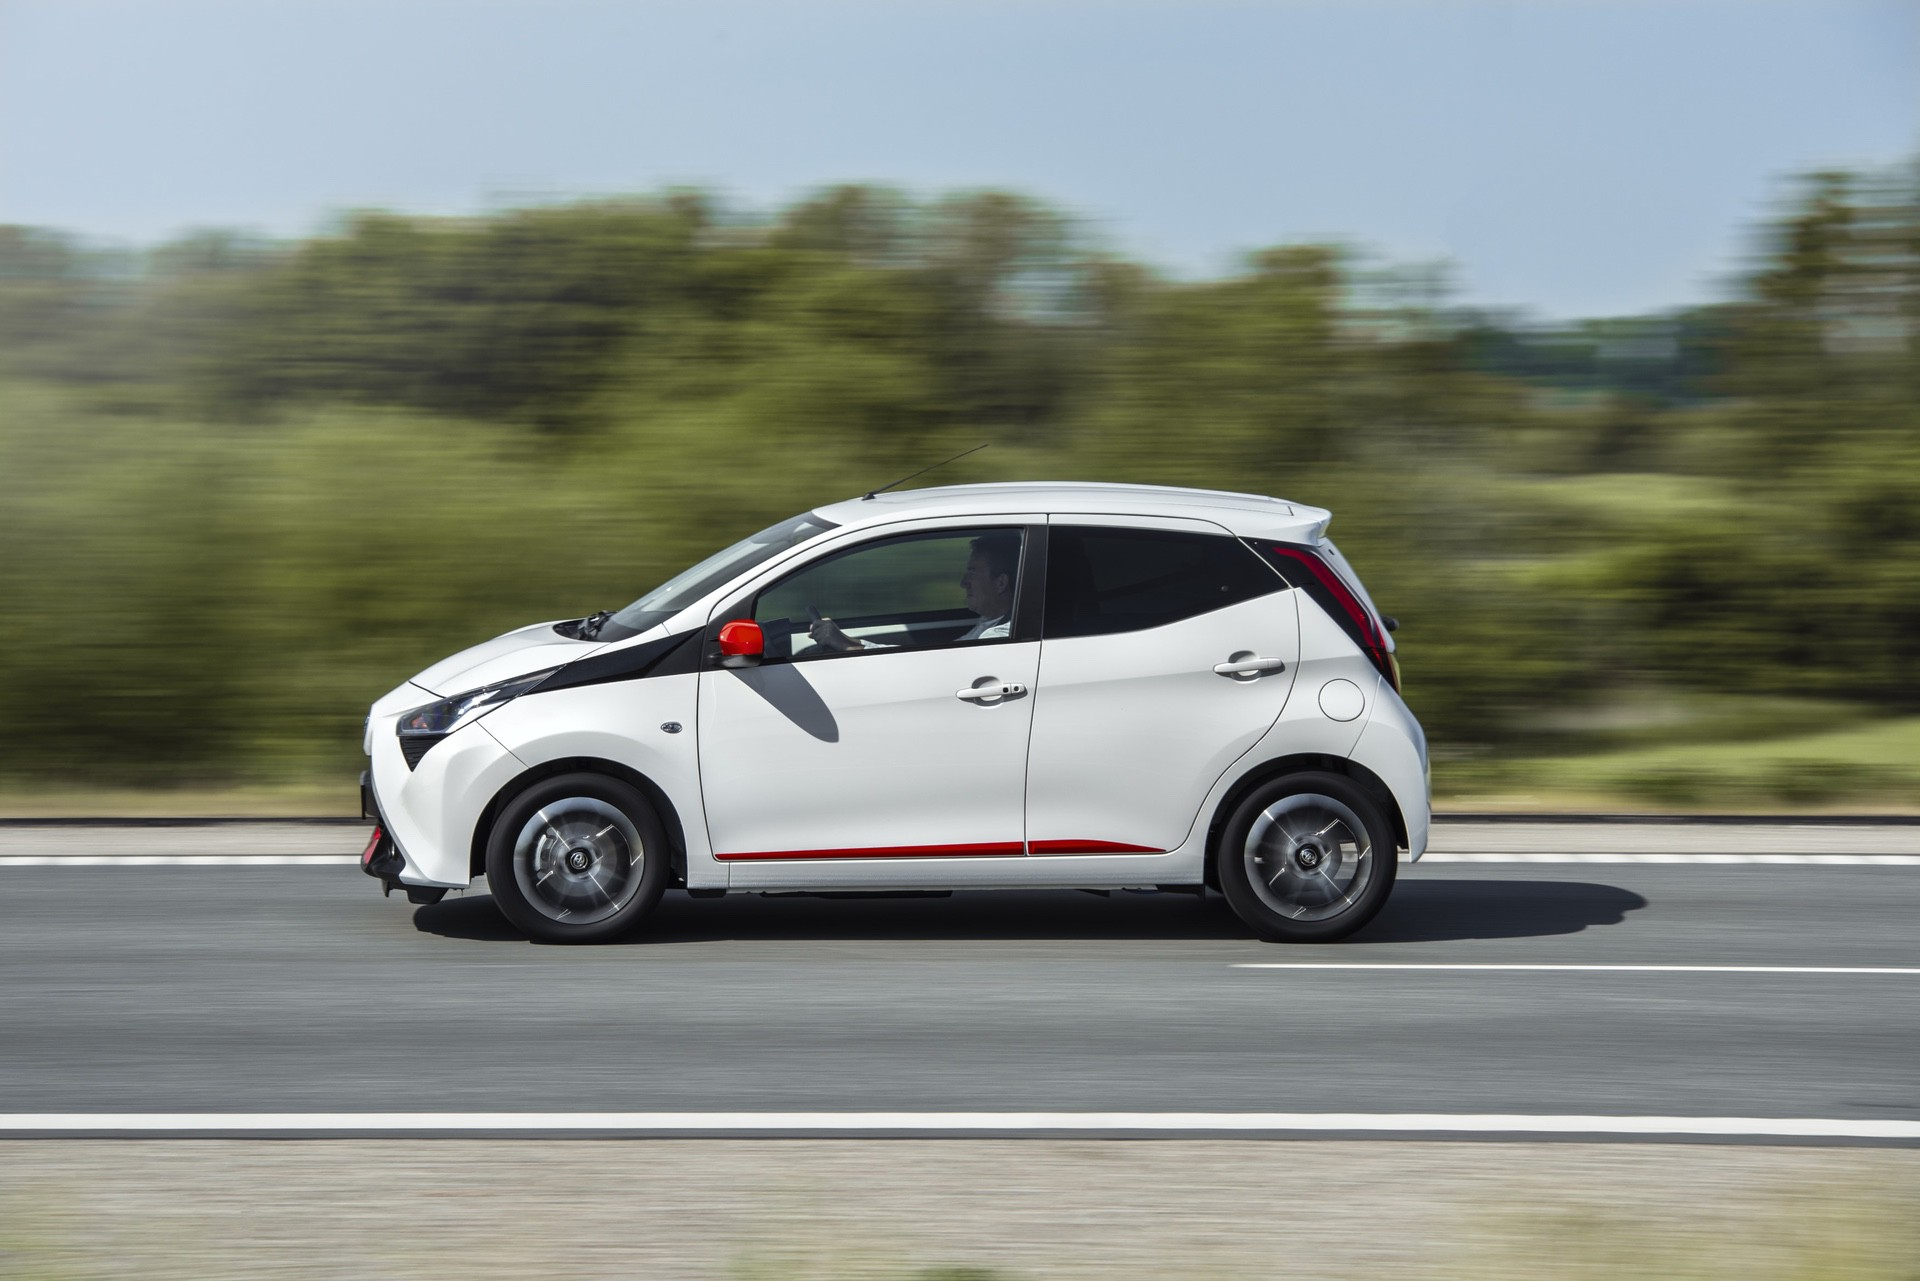 Toyota_Aygo_facelift_presskit_0055